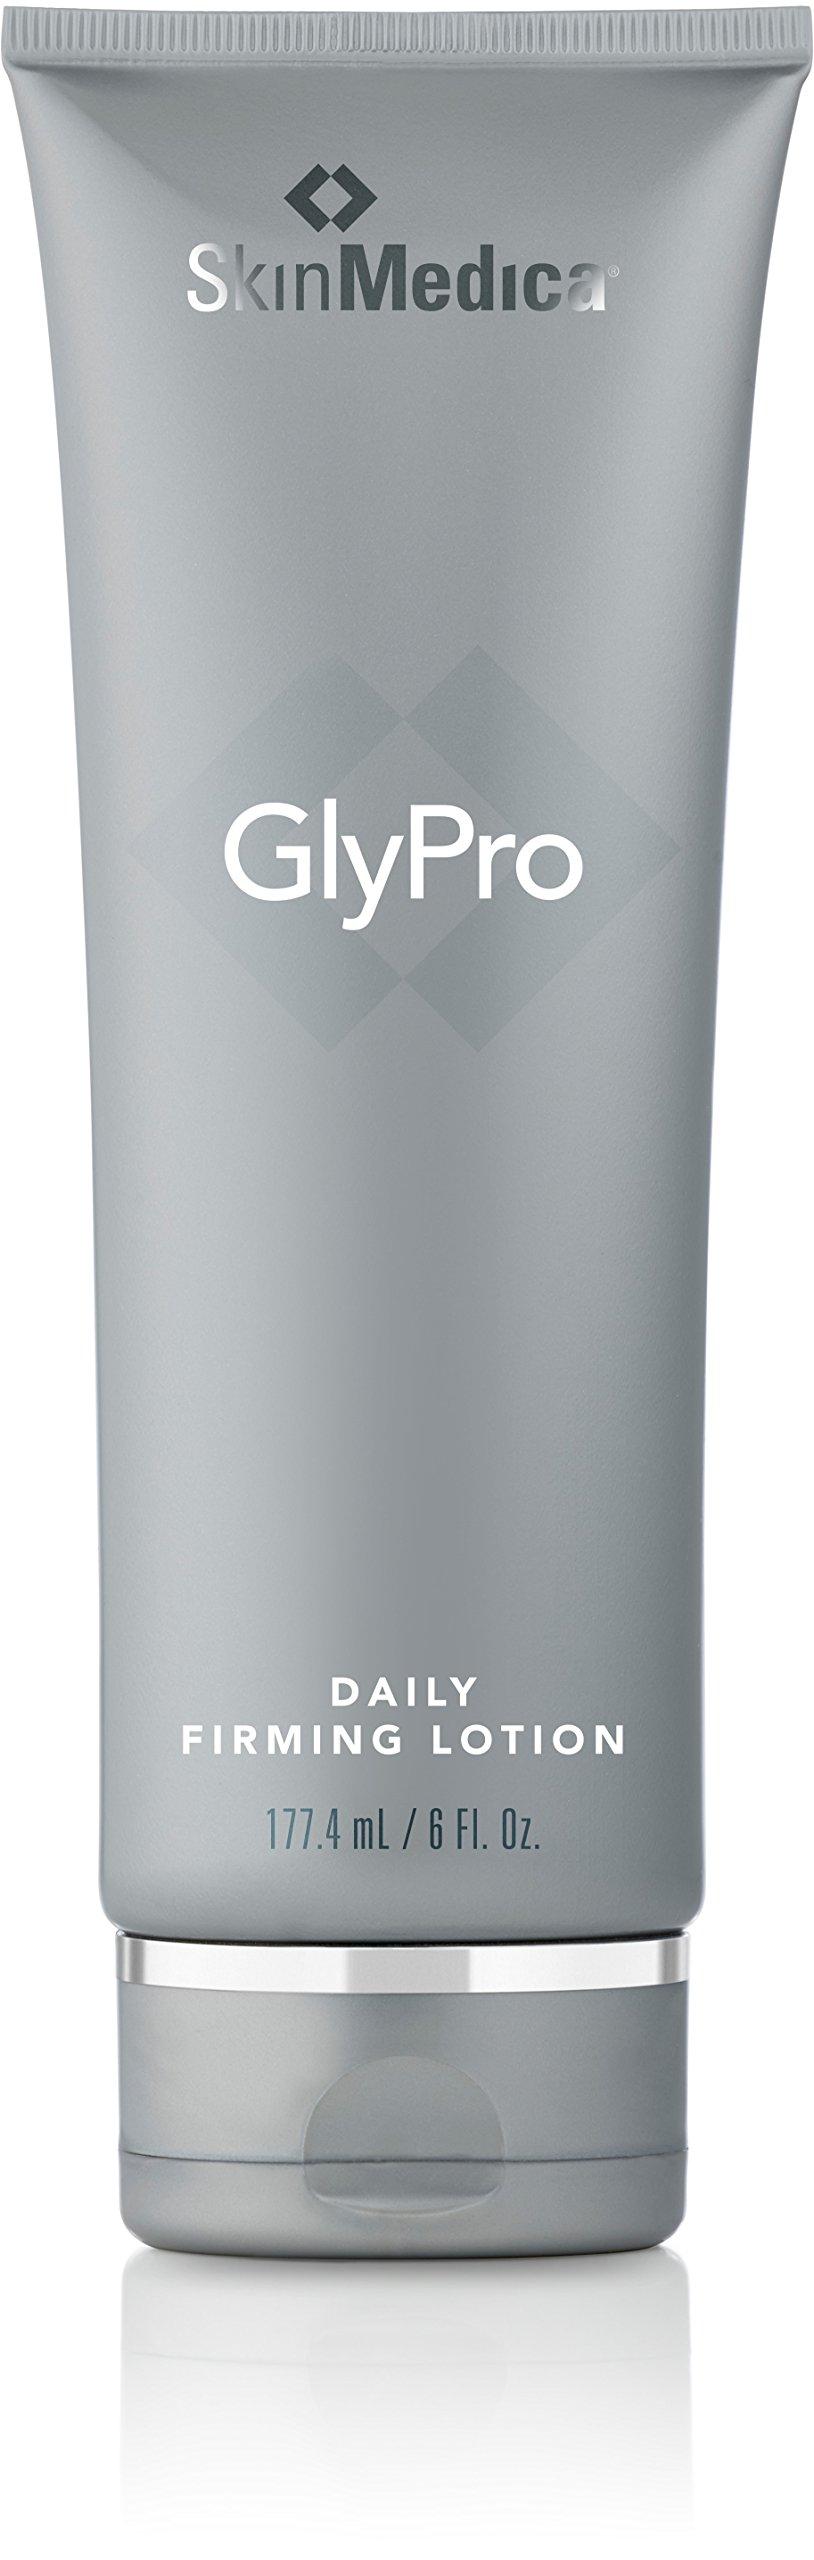 SkinMedica Glypro Daily Firming Lotion, 6 oz.